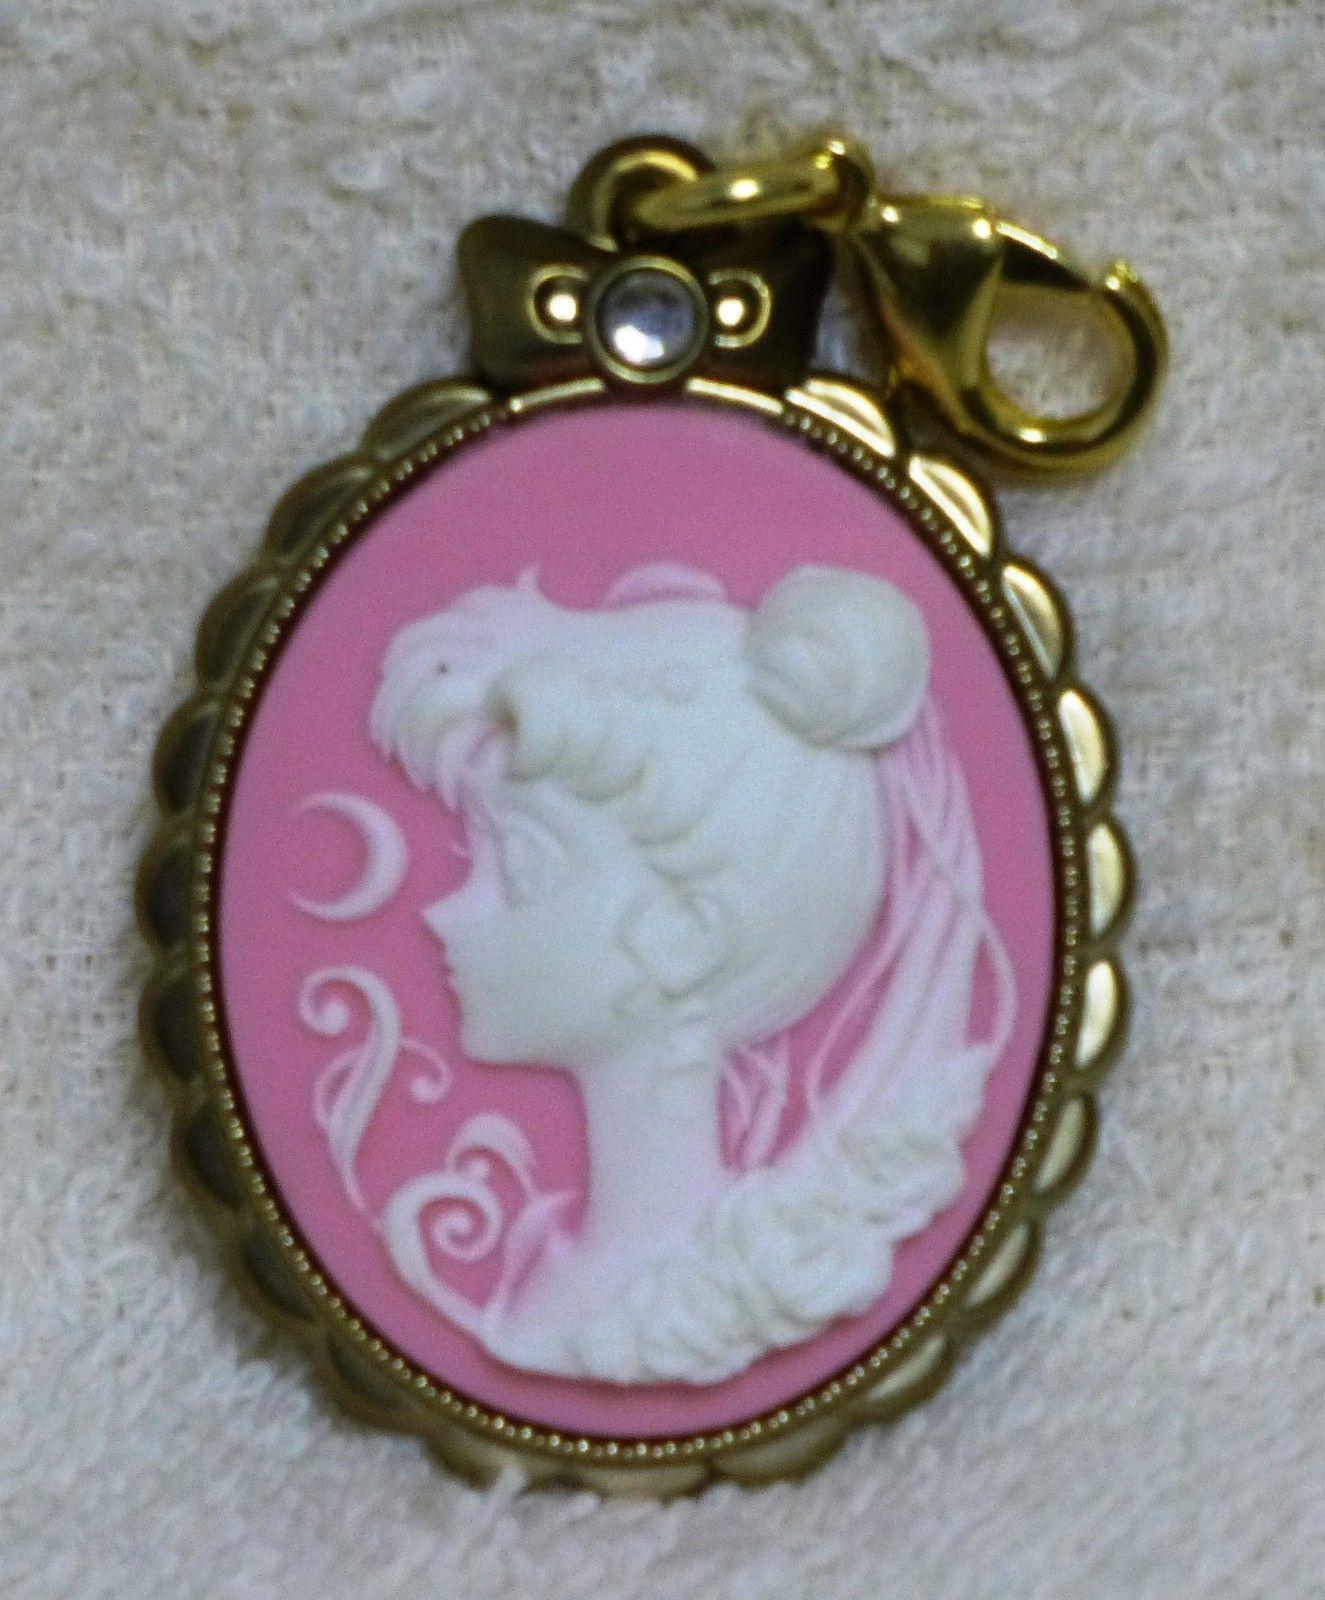 Sailor Moon Cameo Charm Princess Serenity Key Chain Strap Japan Kawaii Anime